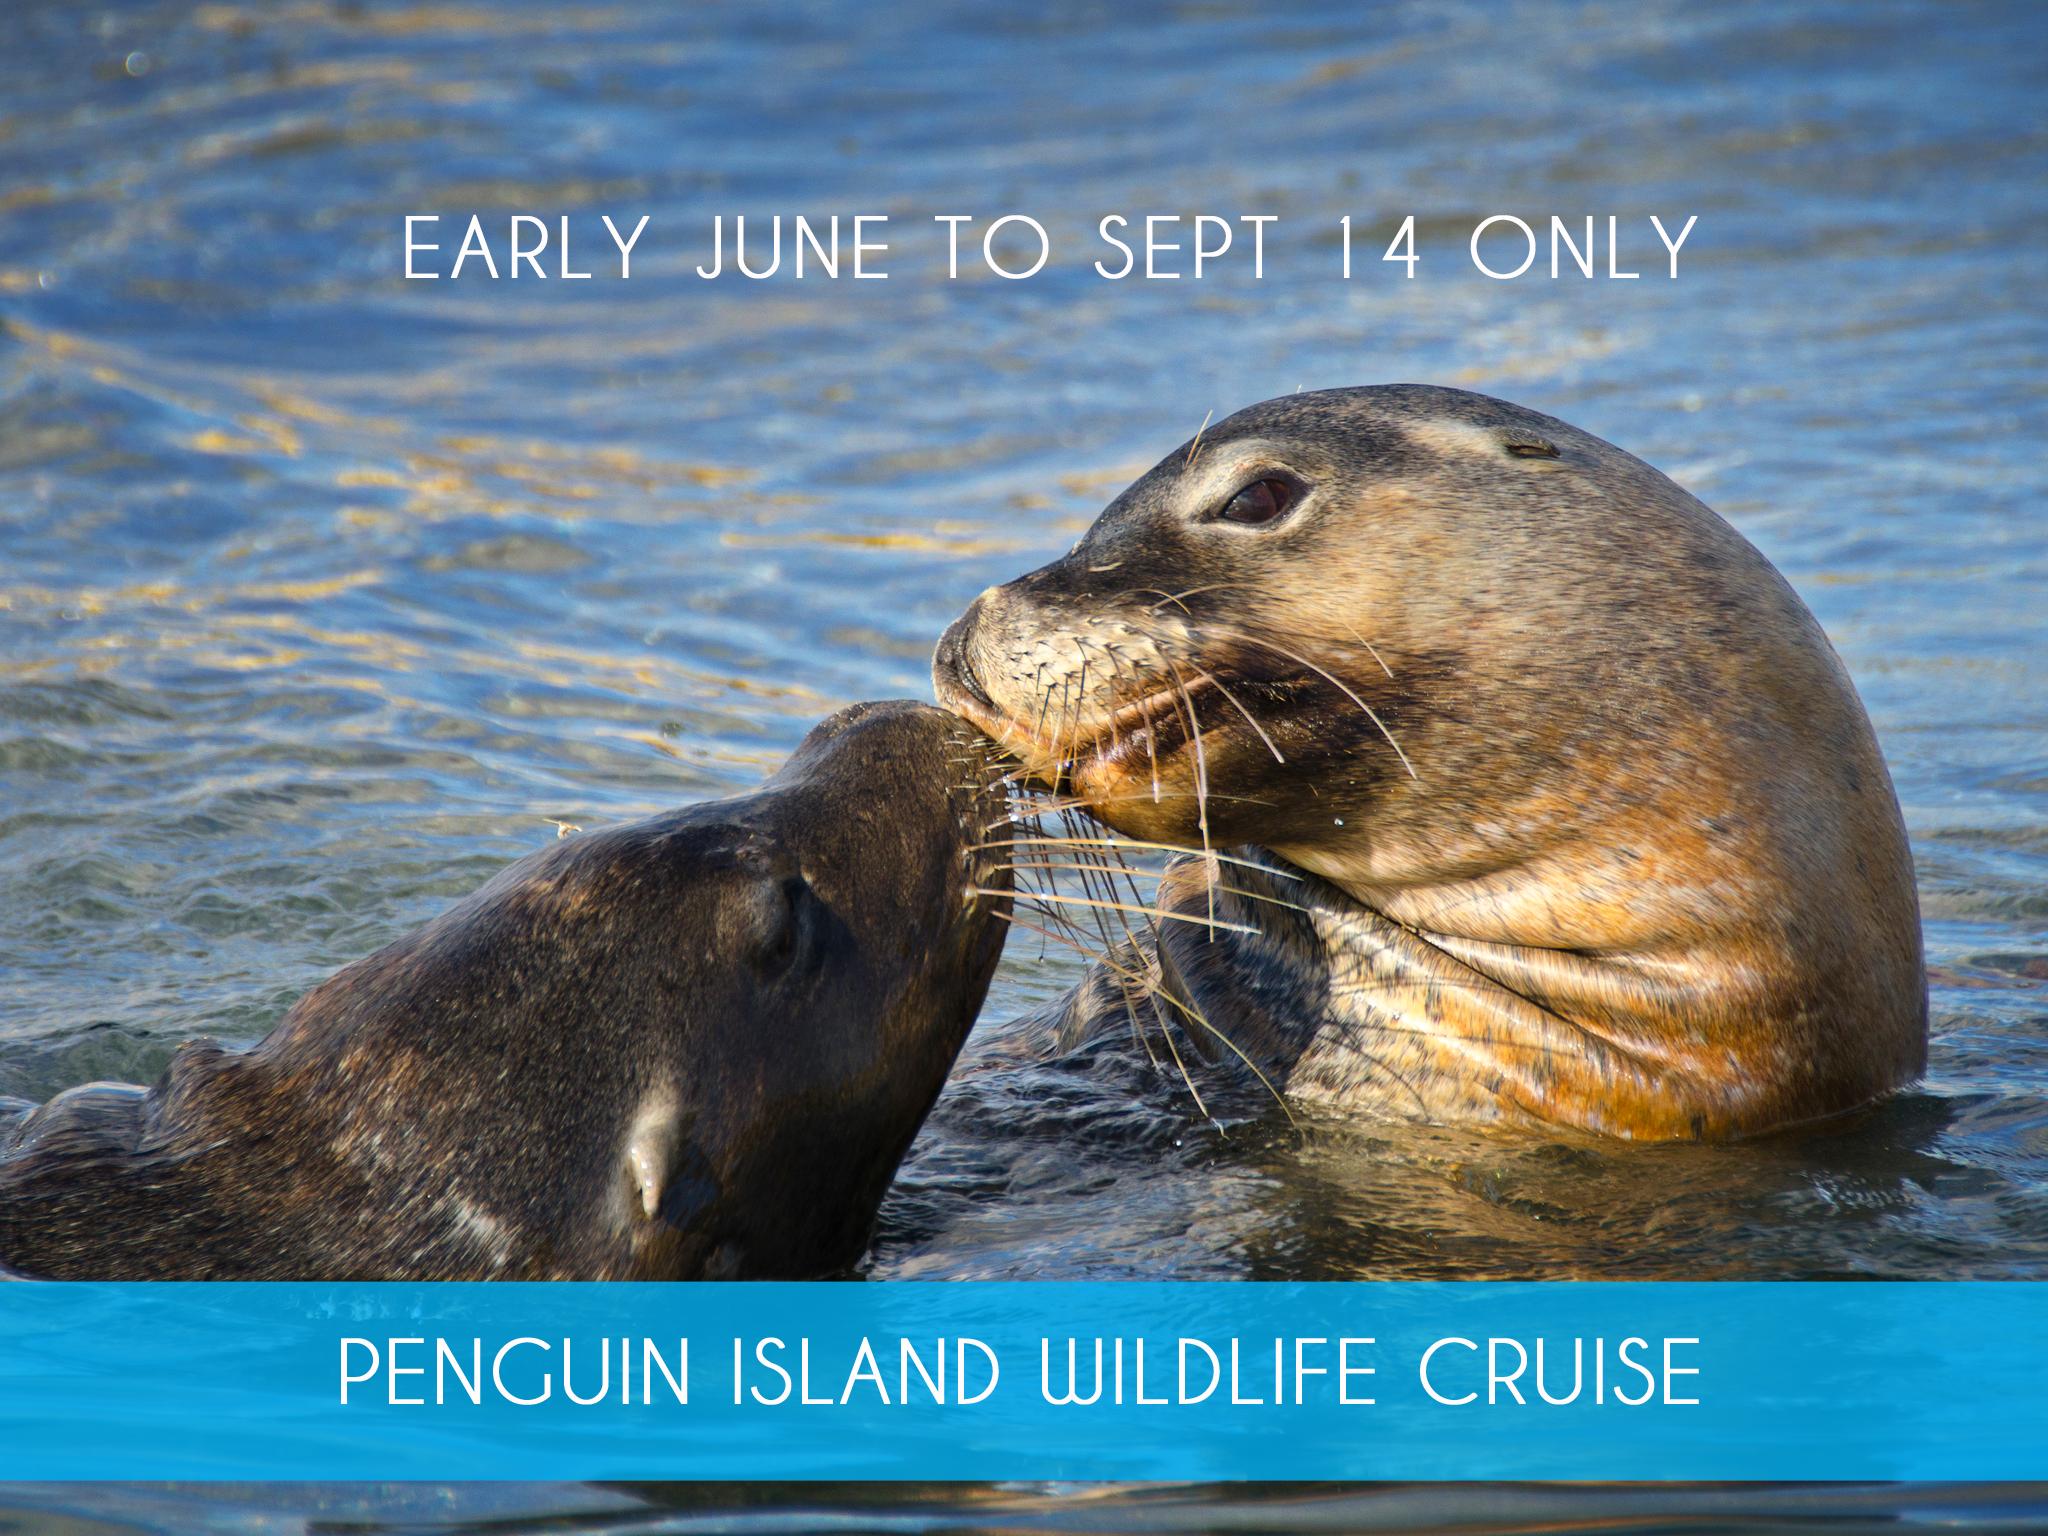 penguin island wildlife cruise.png